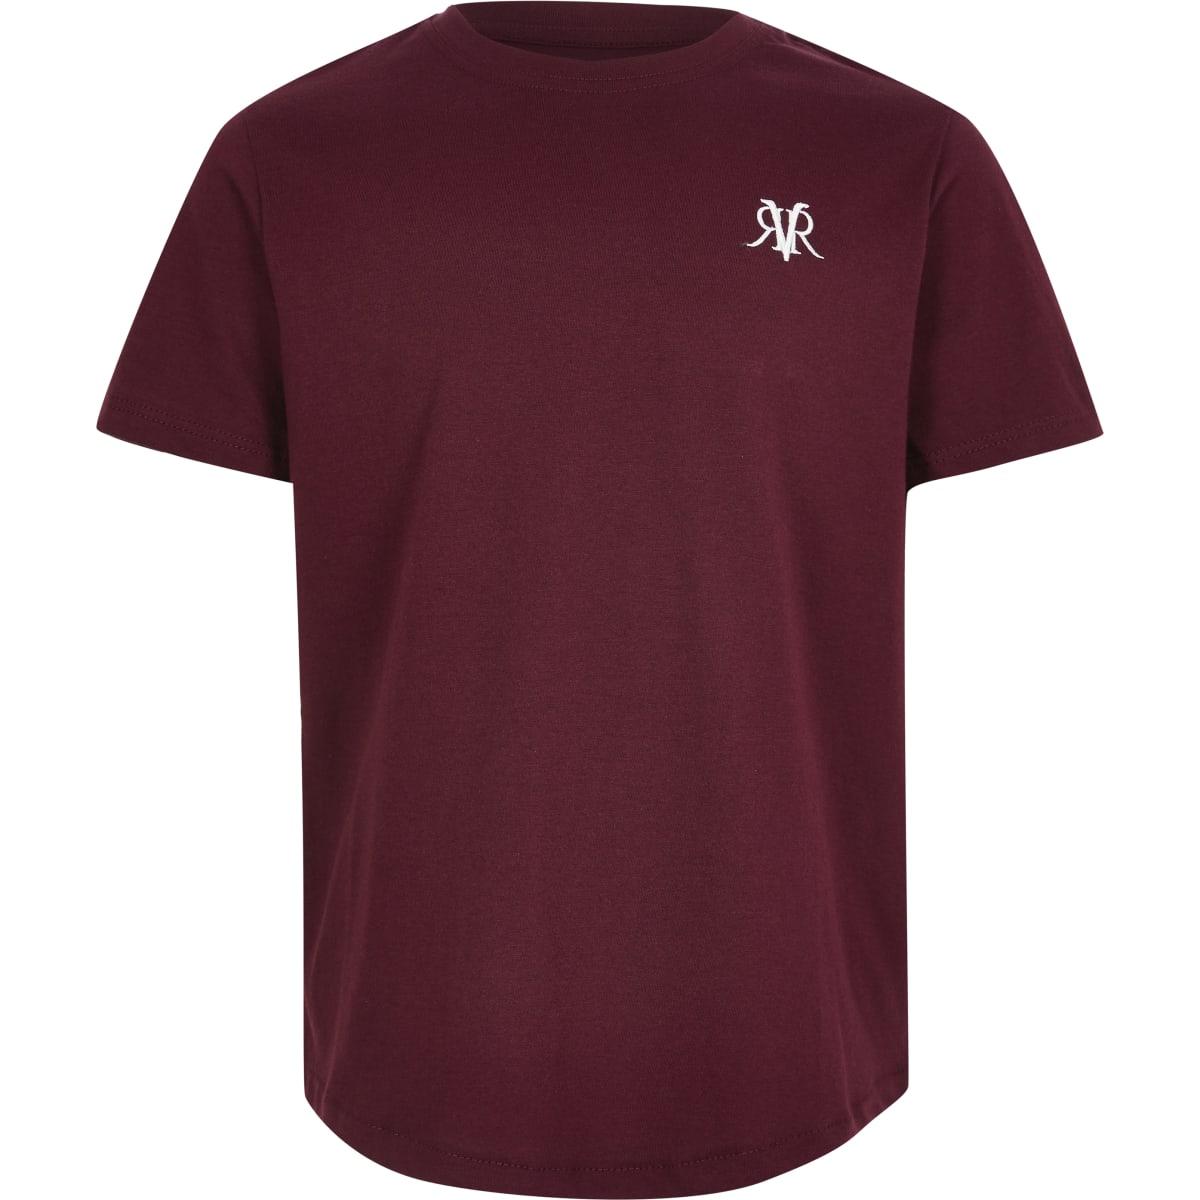 Boys burgundy RI T-shirt